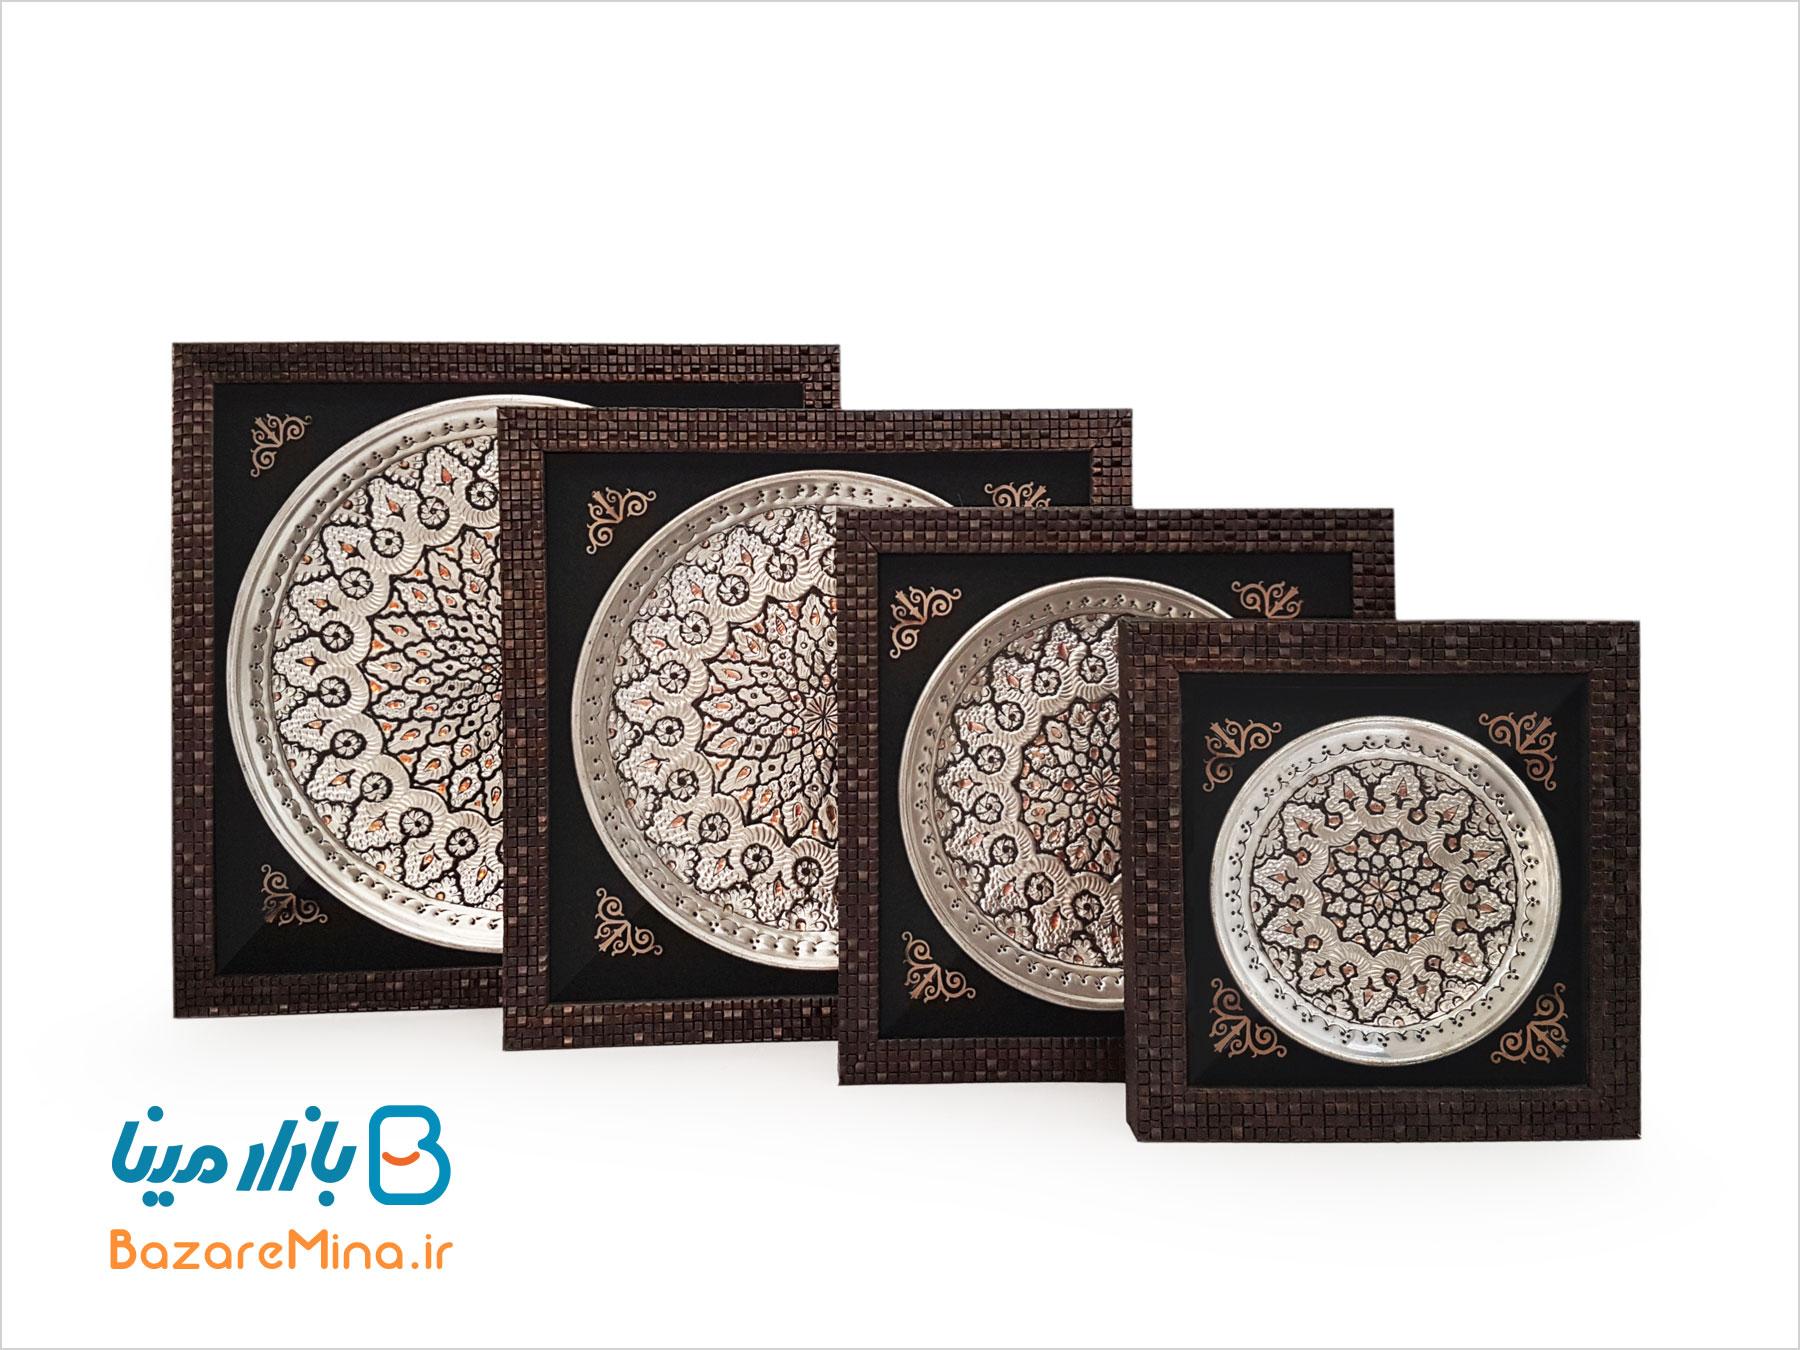 تابلو بشقاب قلمزنی اصفهان قطر 15 سانتی